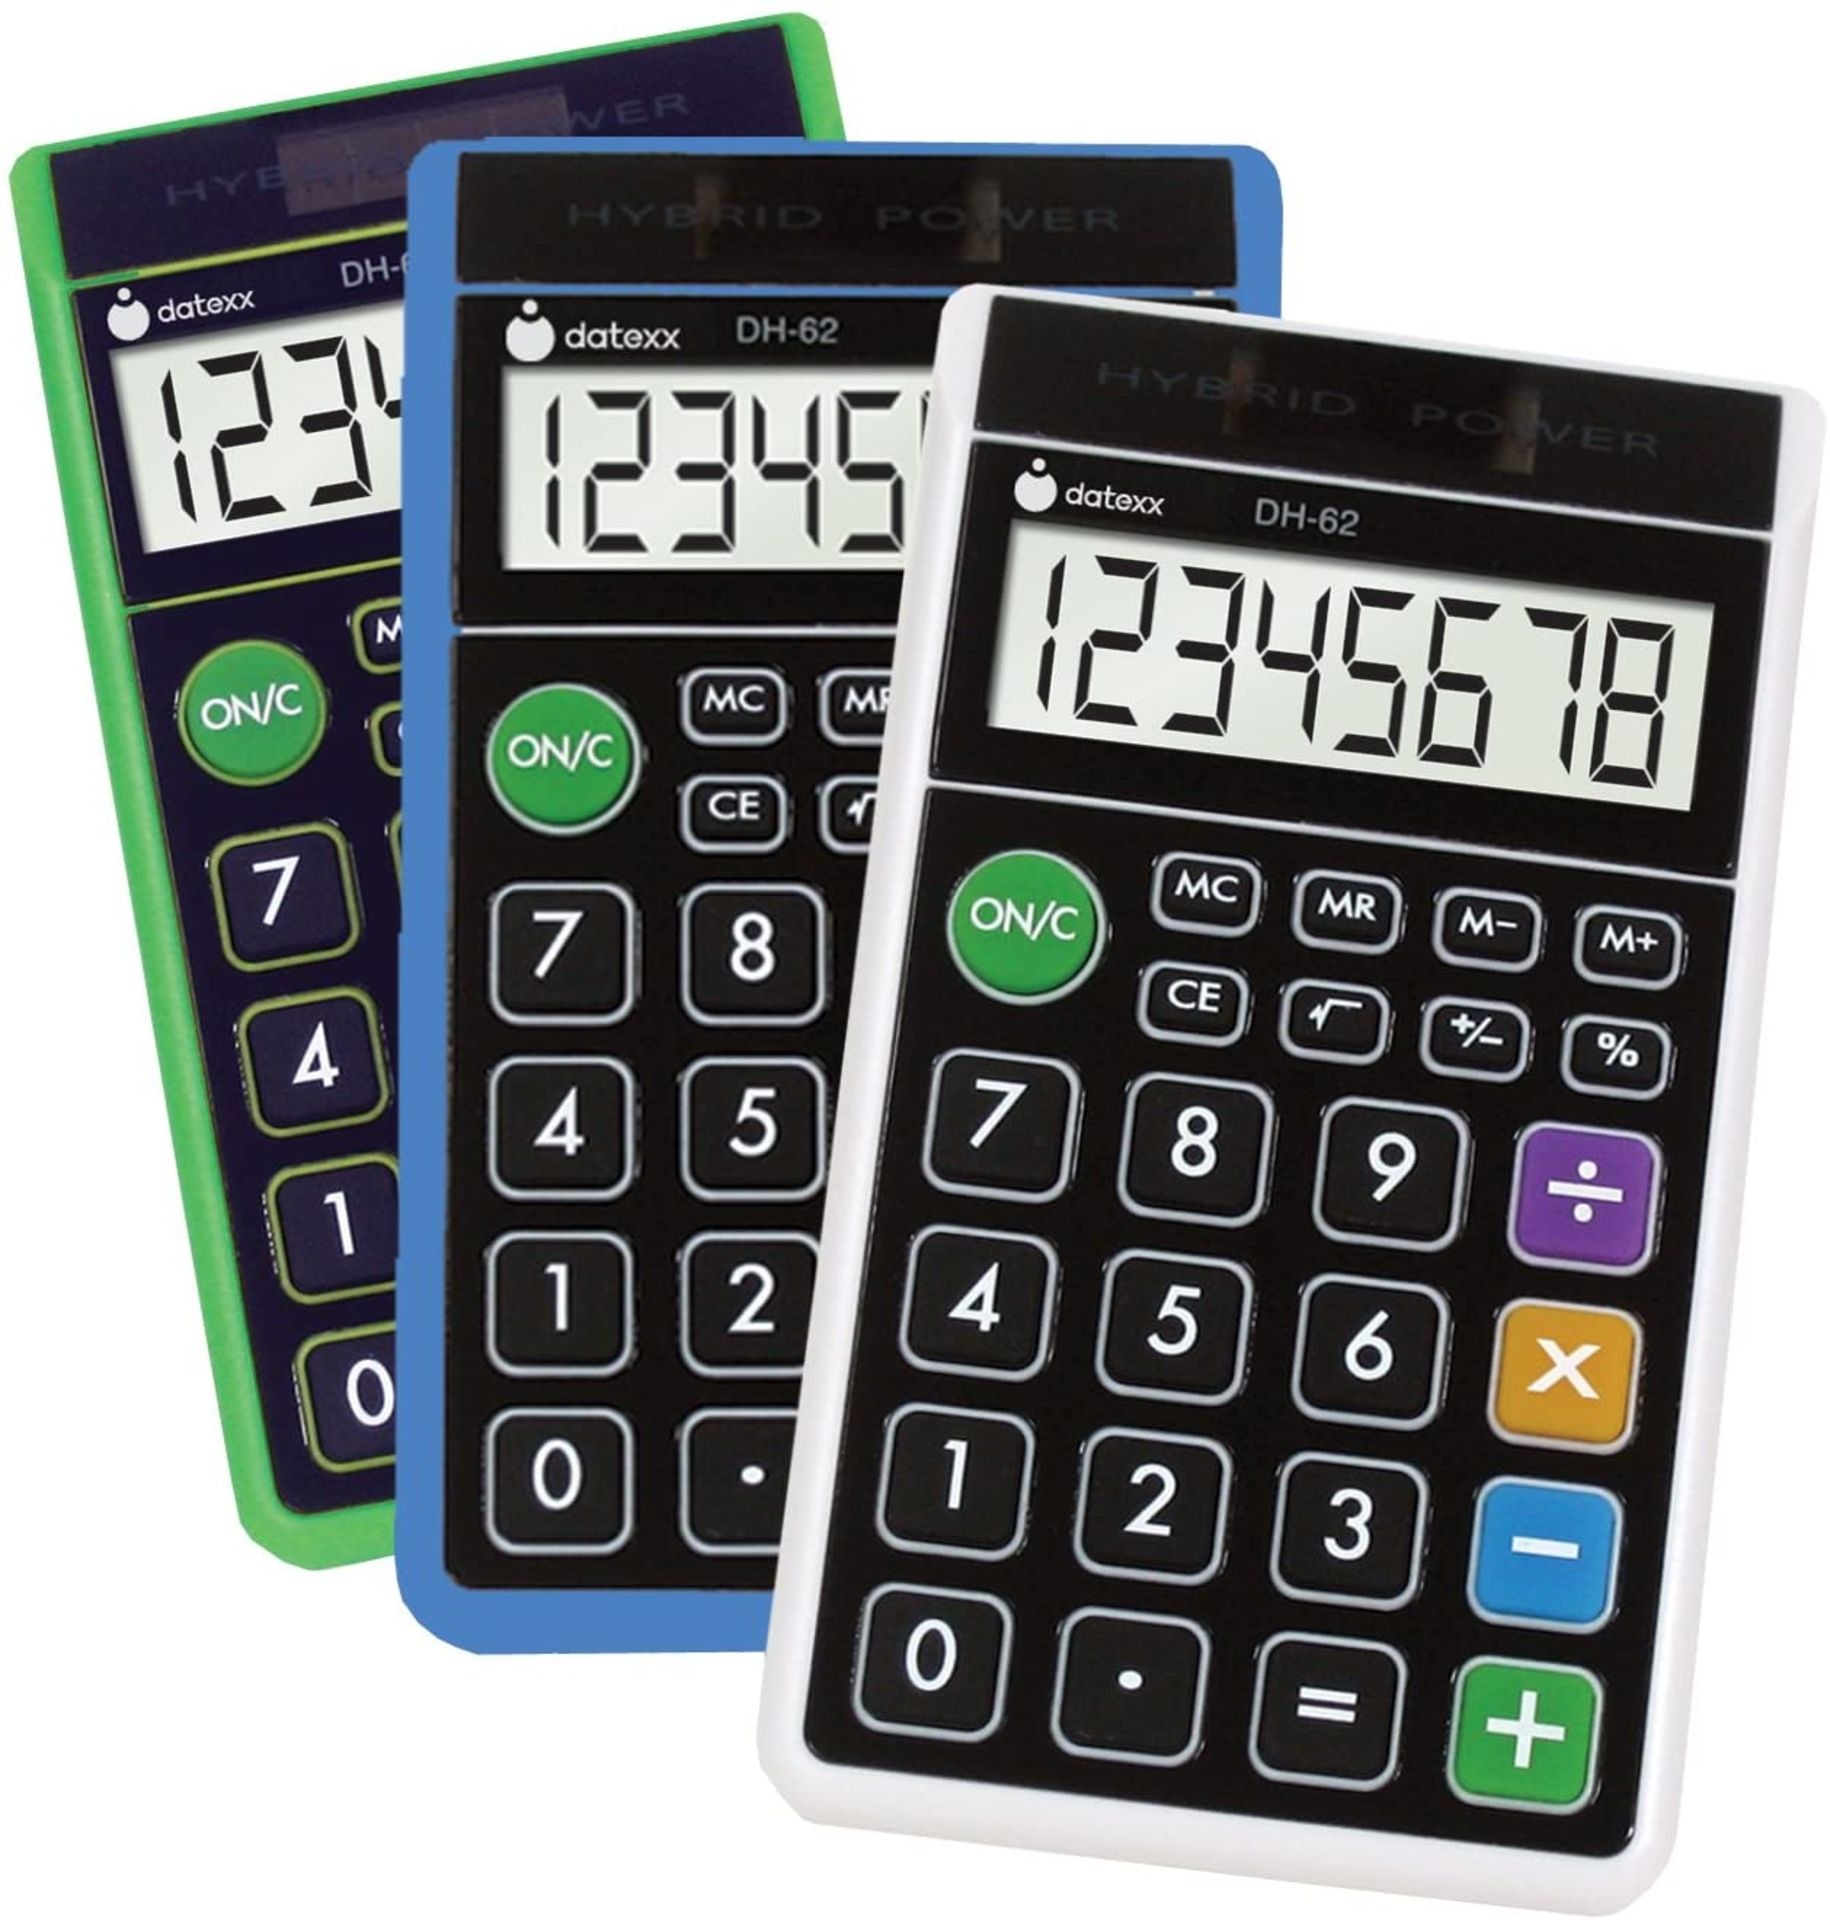 10 x Brand New Datexx Hybrid Power Dh-62 Calculators